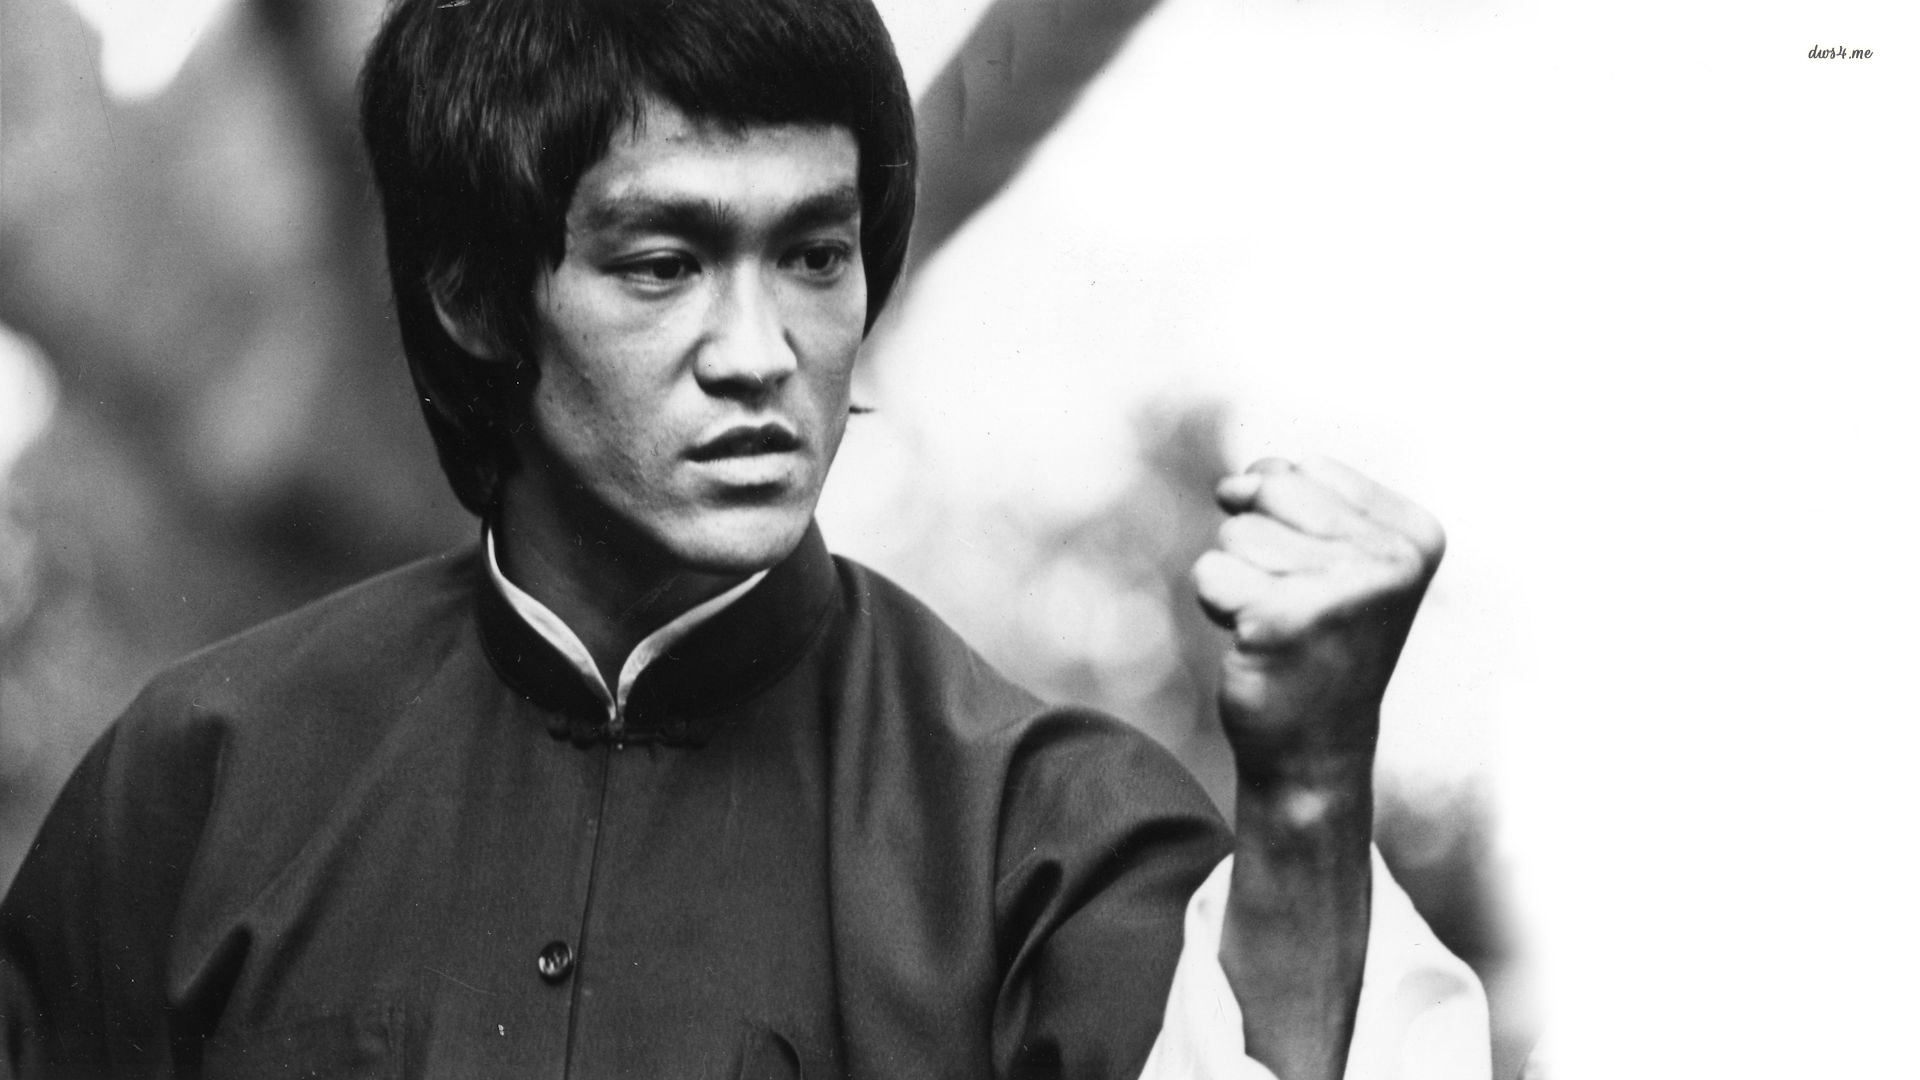 Bruce Lee networkokulu.net motivasyon sözleri 1